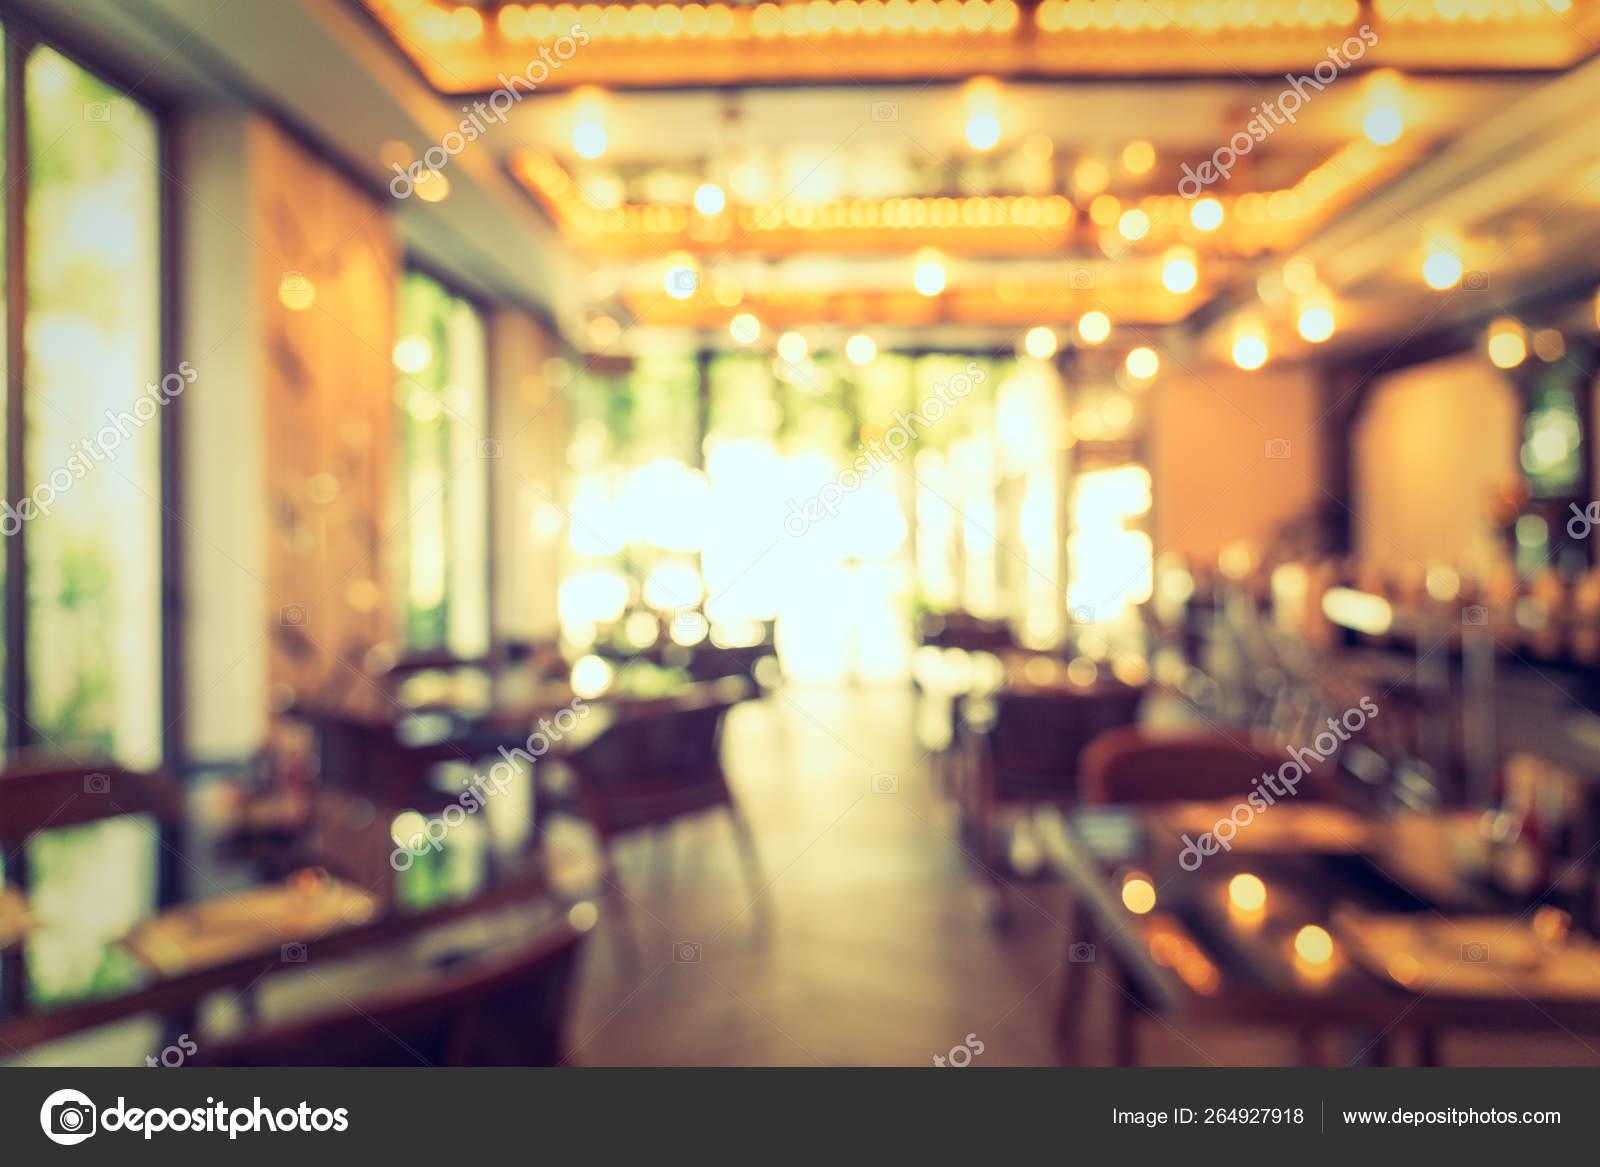 Abstract Blur Defocused Coffee Shop Cafe Restaurant Interior Background Stock Photo C Mrsiraphol 264927918